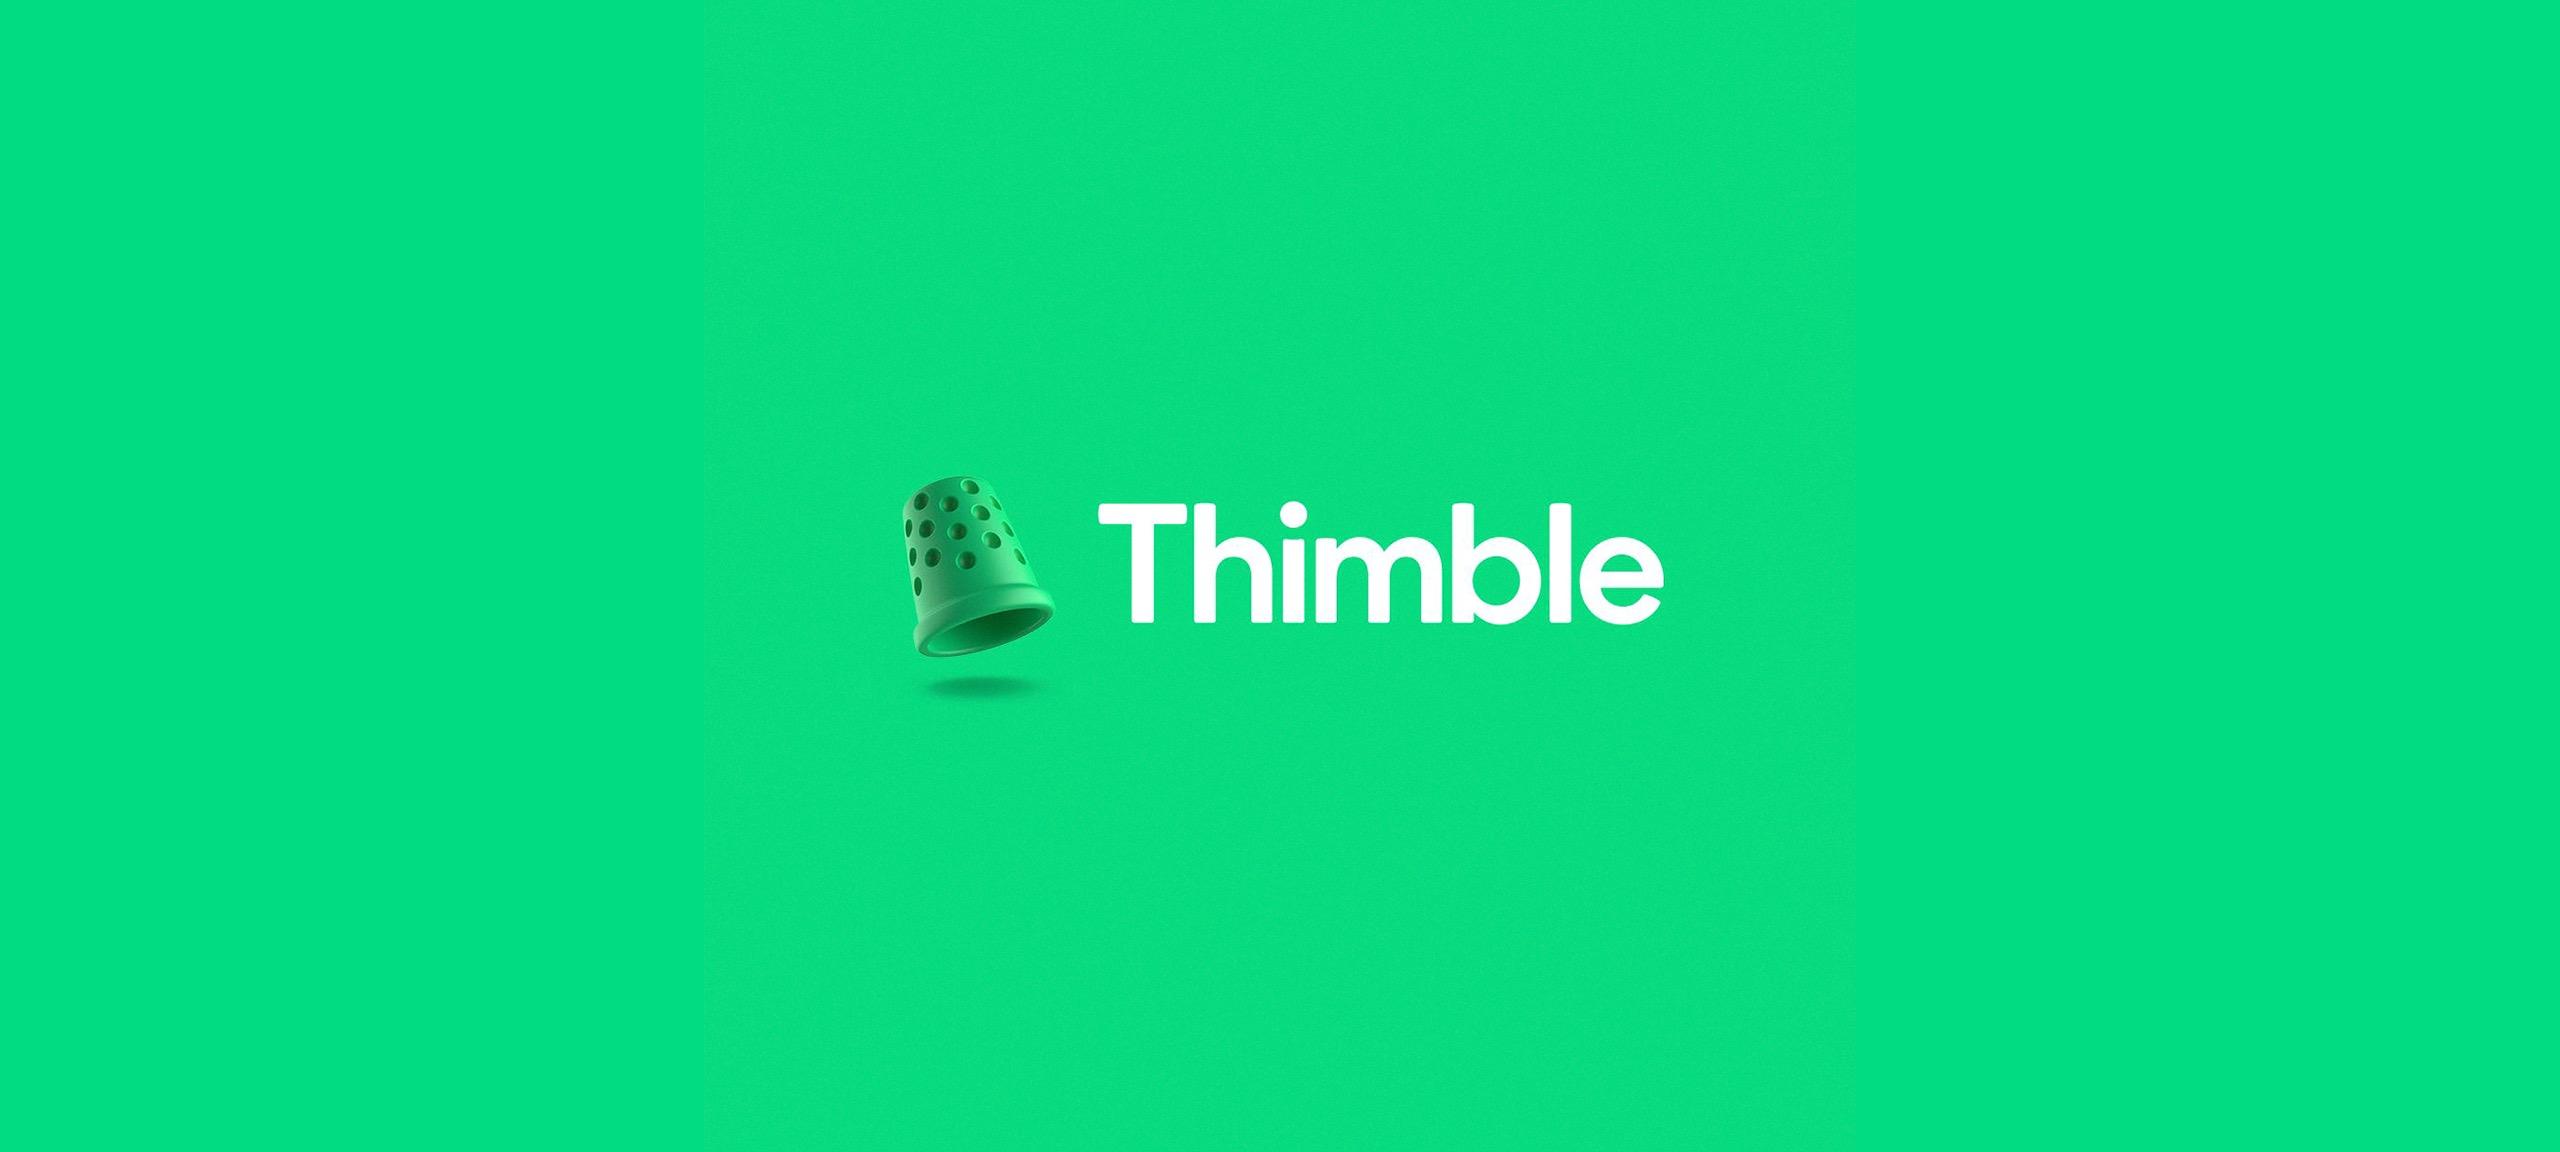 Thimble logo hero image